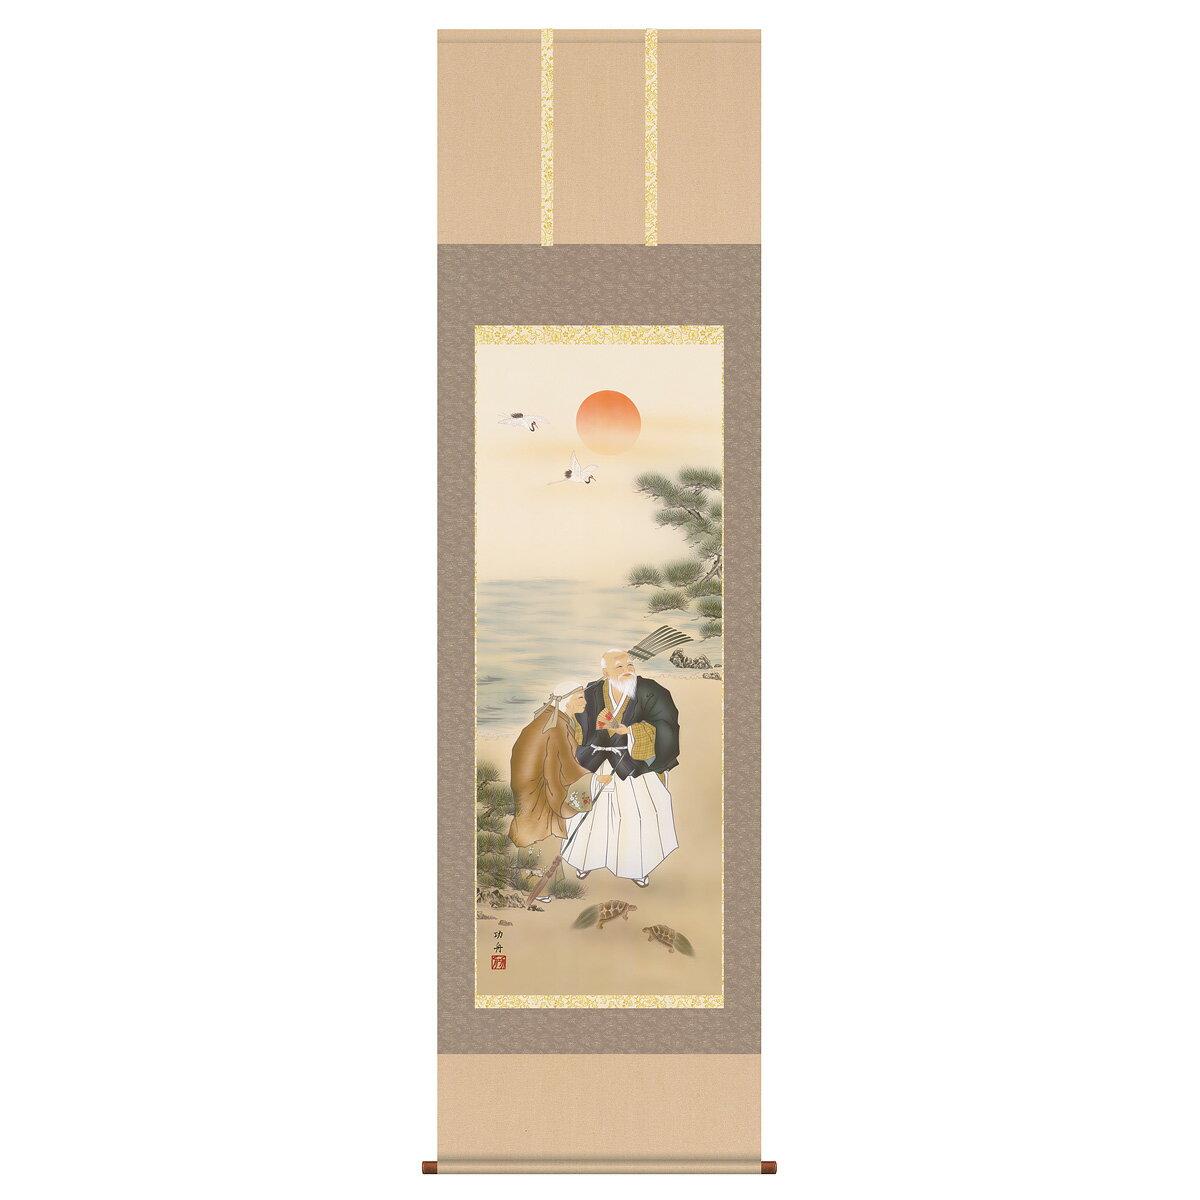 端午の節句 正月 掛け軸 掛軸 「瀬田功舟(洛友会)作 高砂」 ●正月飾り 端午の節句